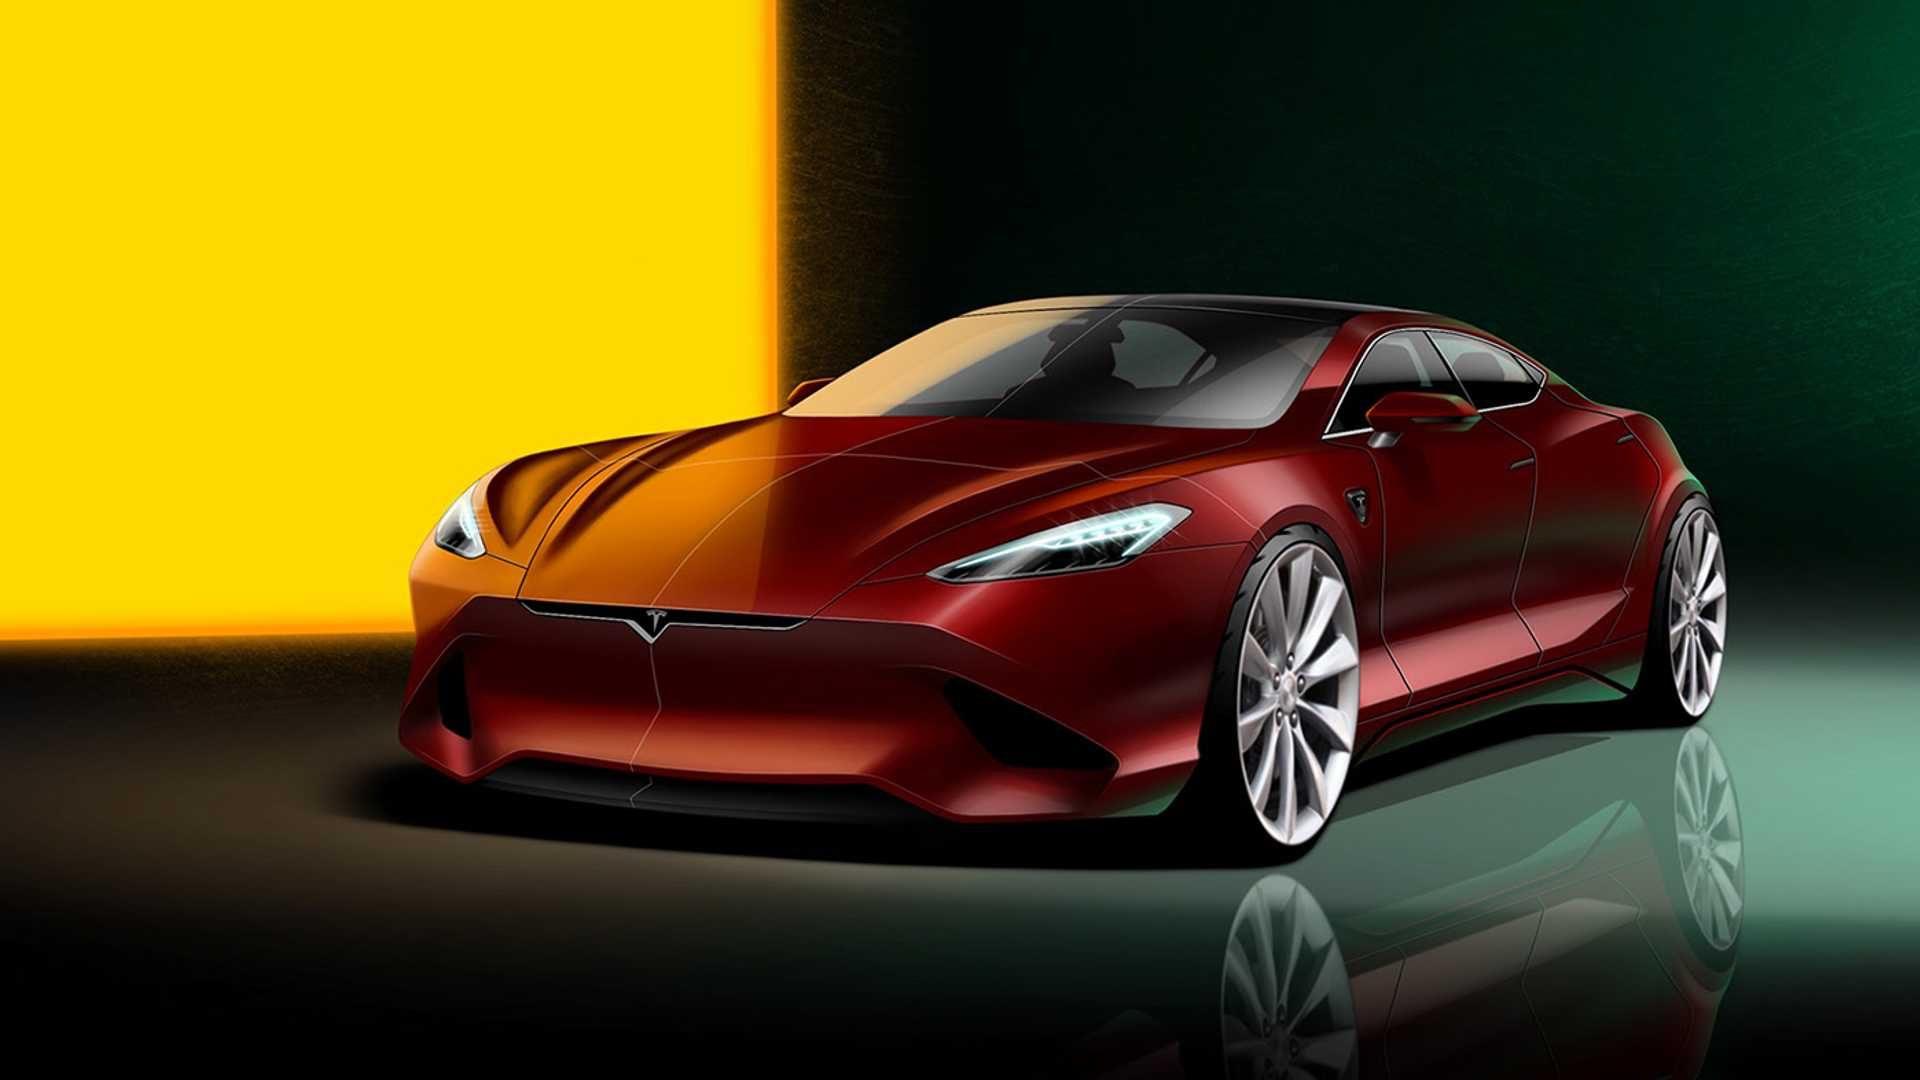 Tesla Model S new generation rendering